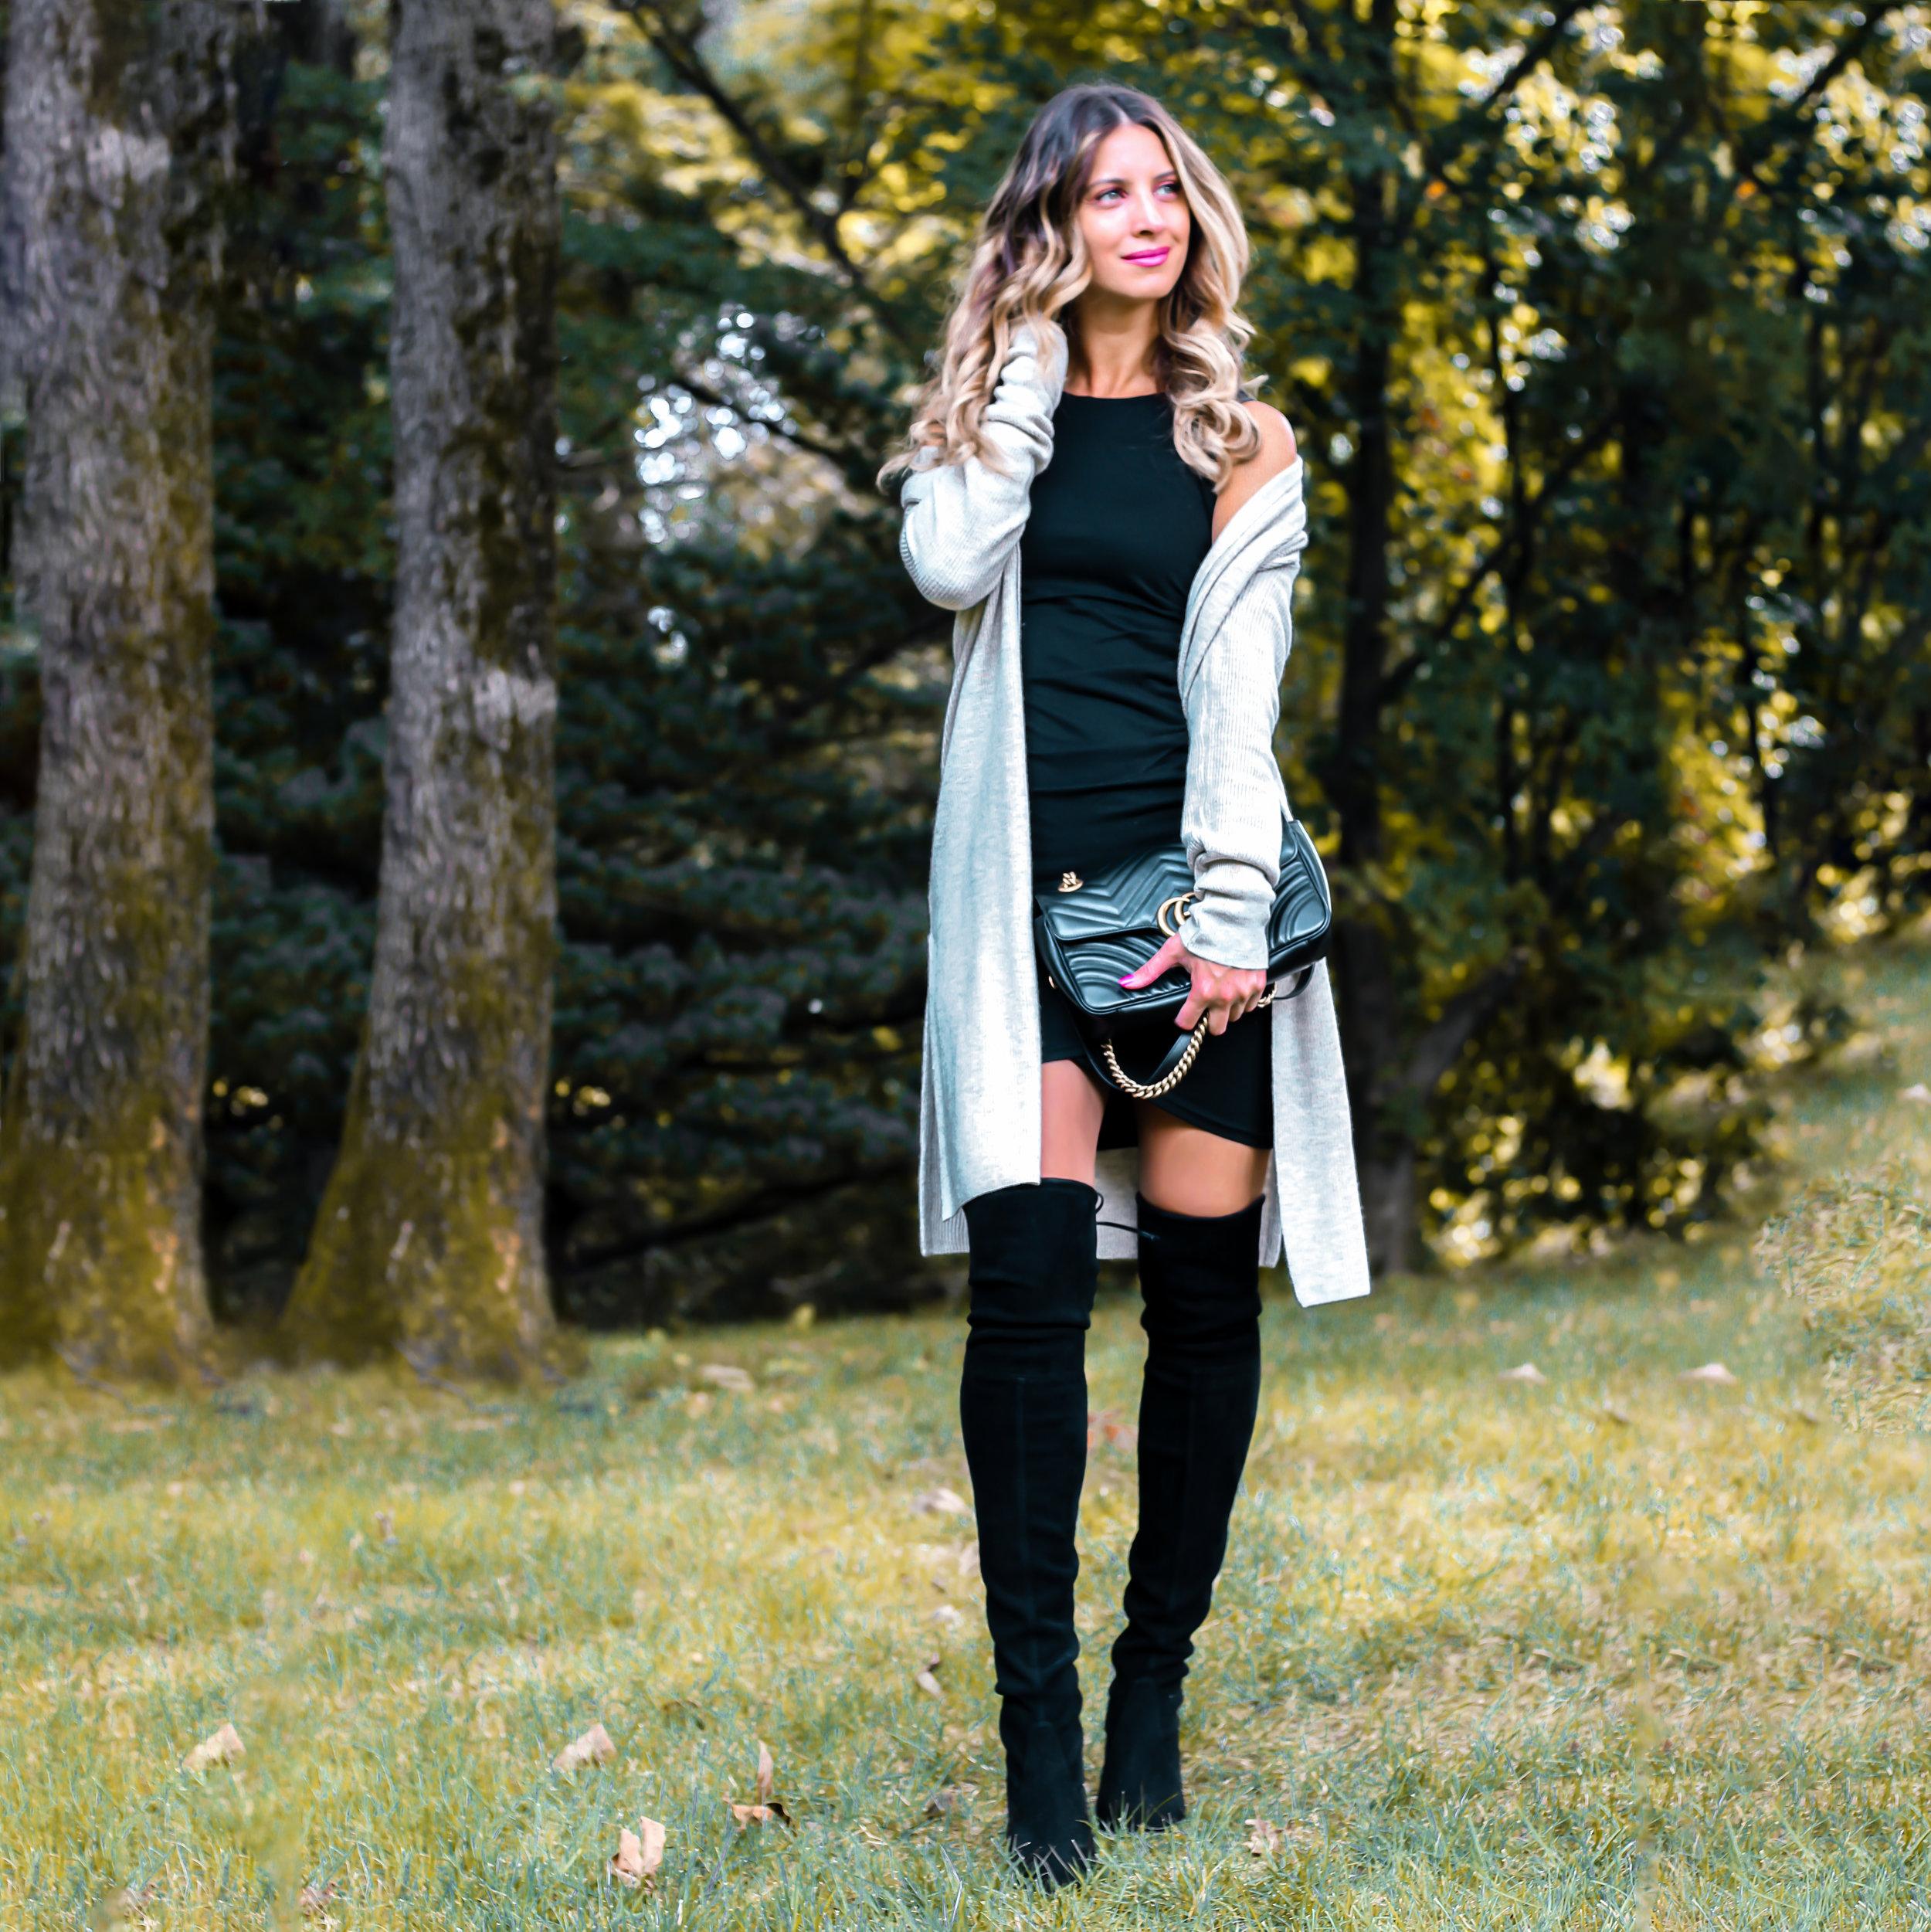 beige cardigan + black dress insta.jpg